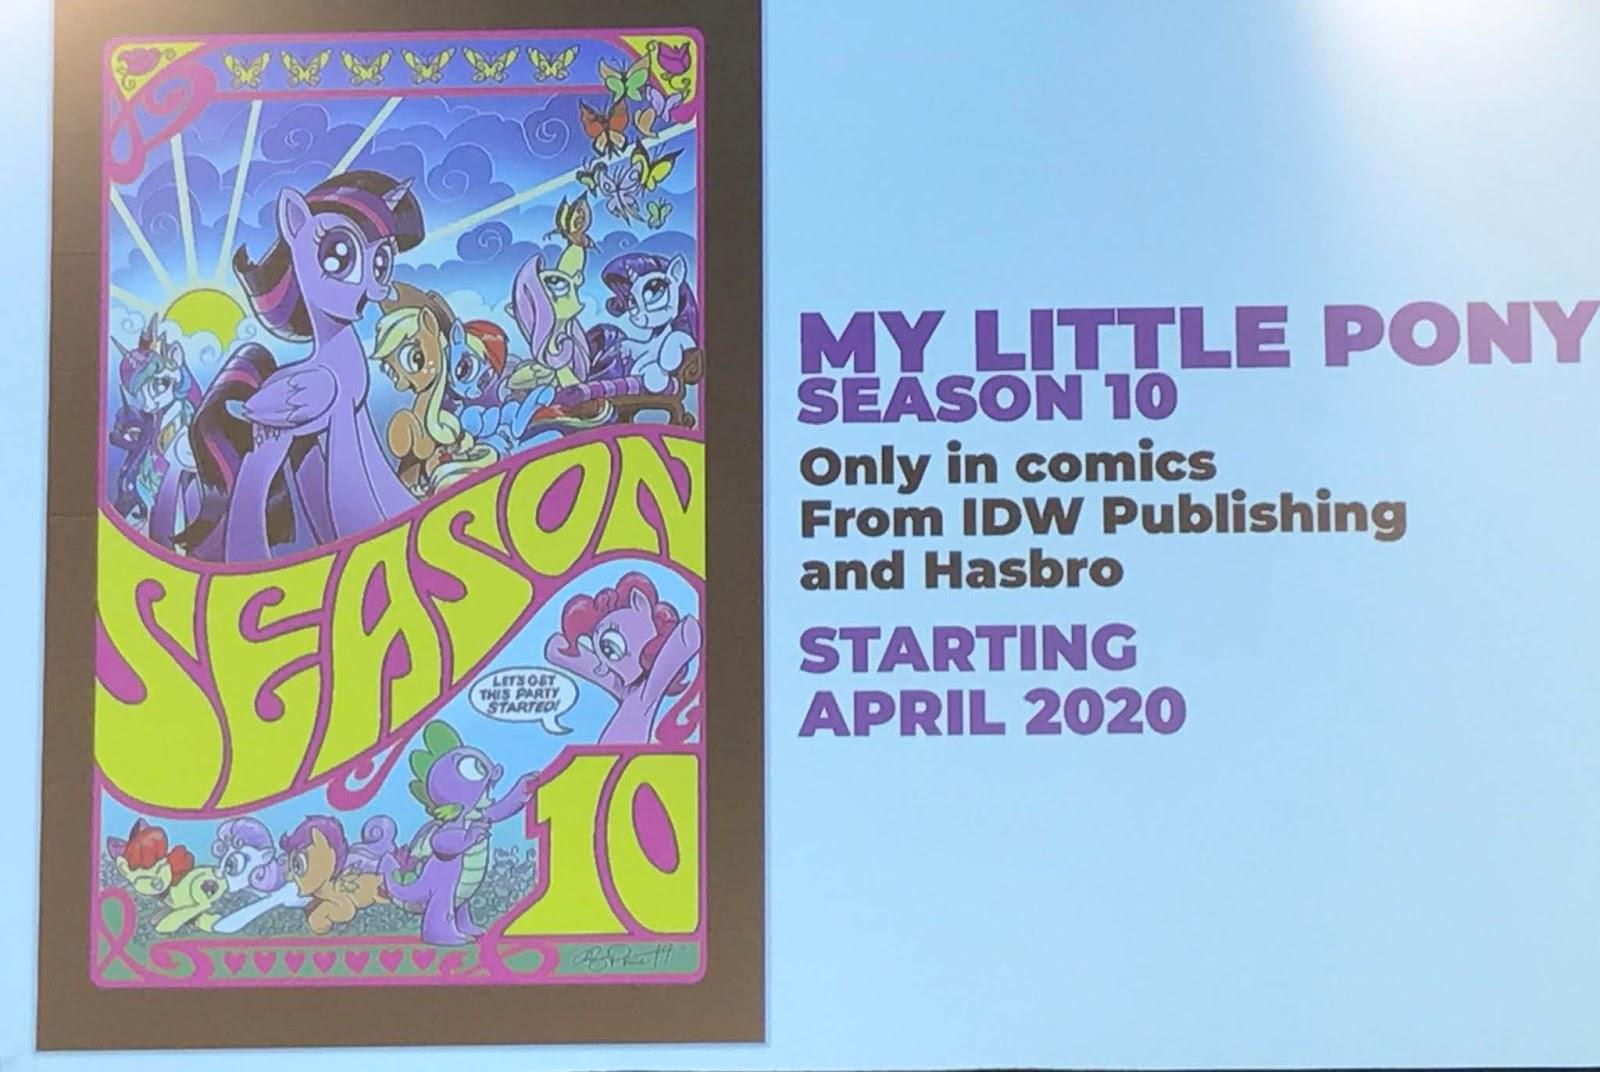 Equestria Daily Mlp Stuff Idw My Little Pony Season 10 Comic Series Announced